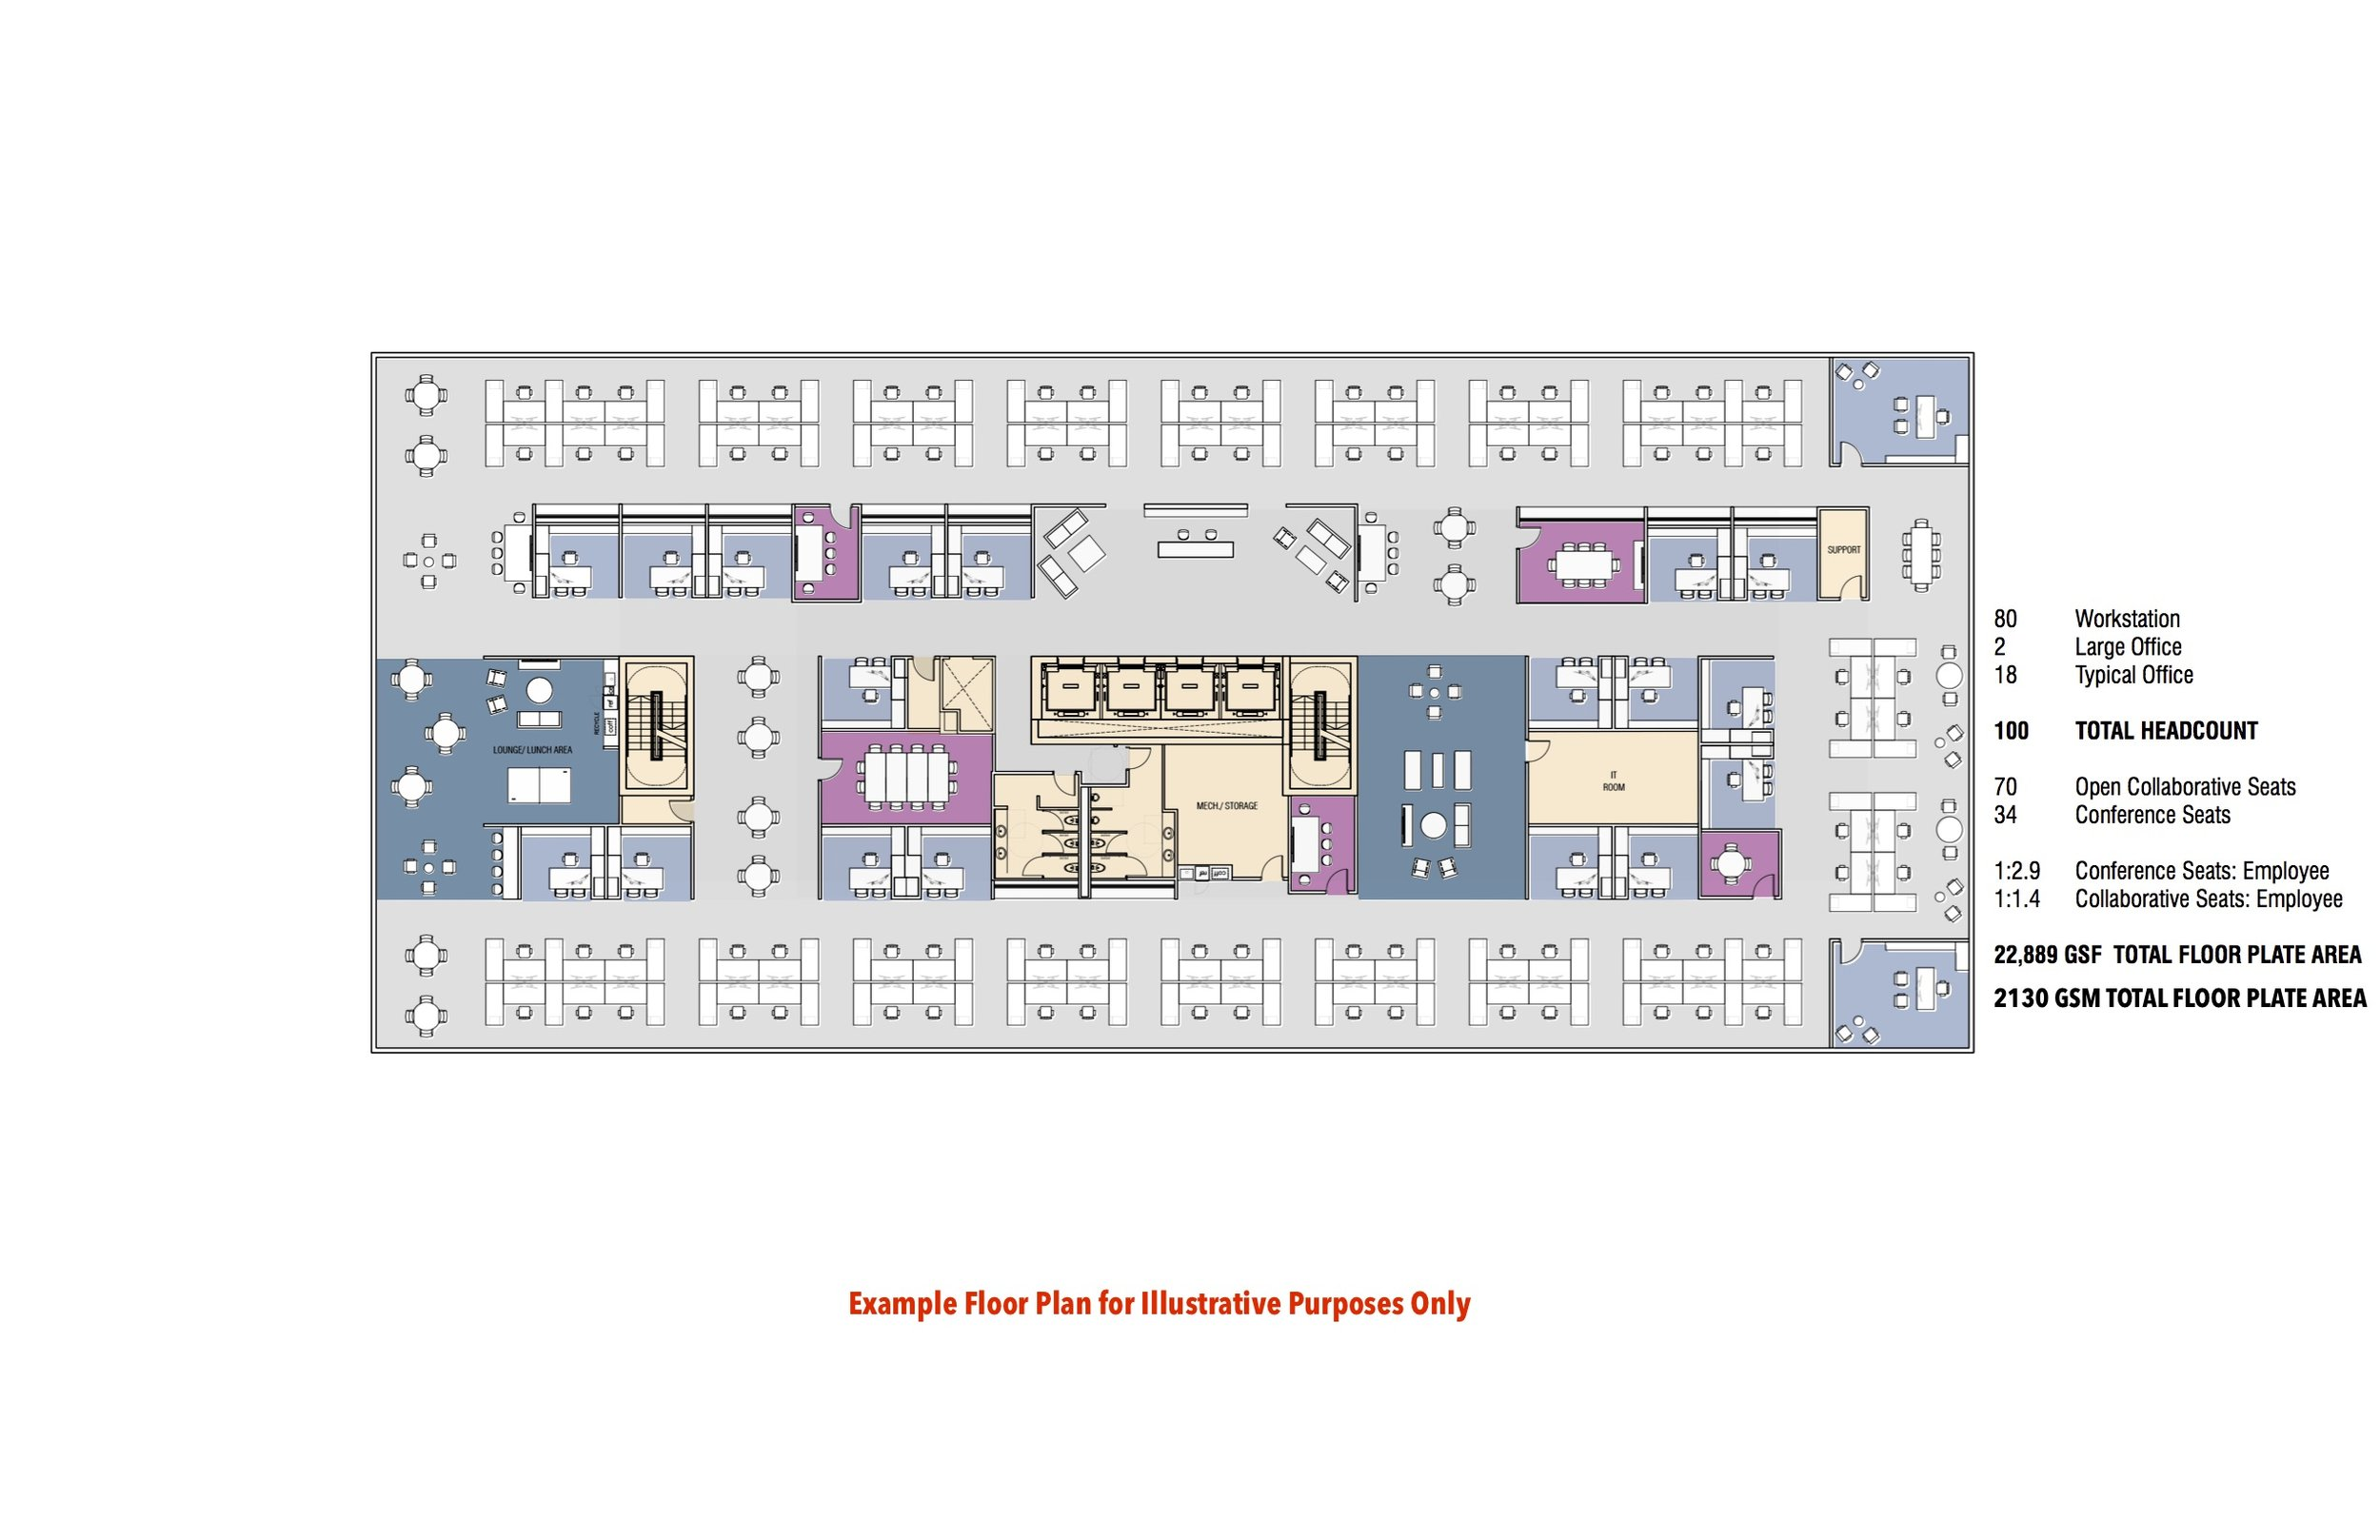 Example Class A Floor Plan